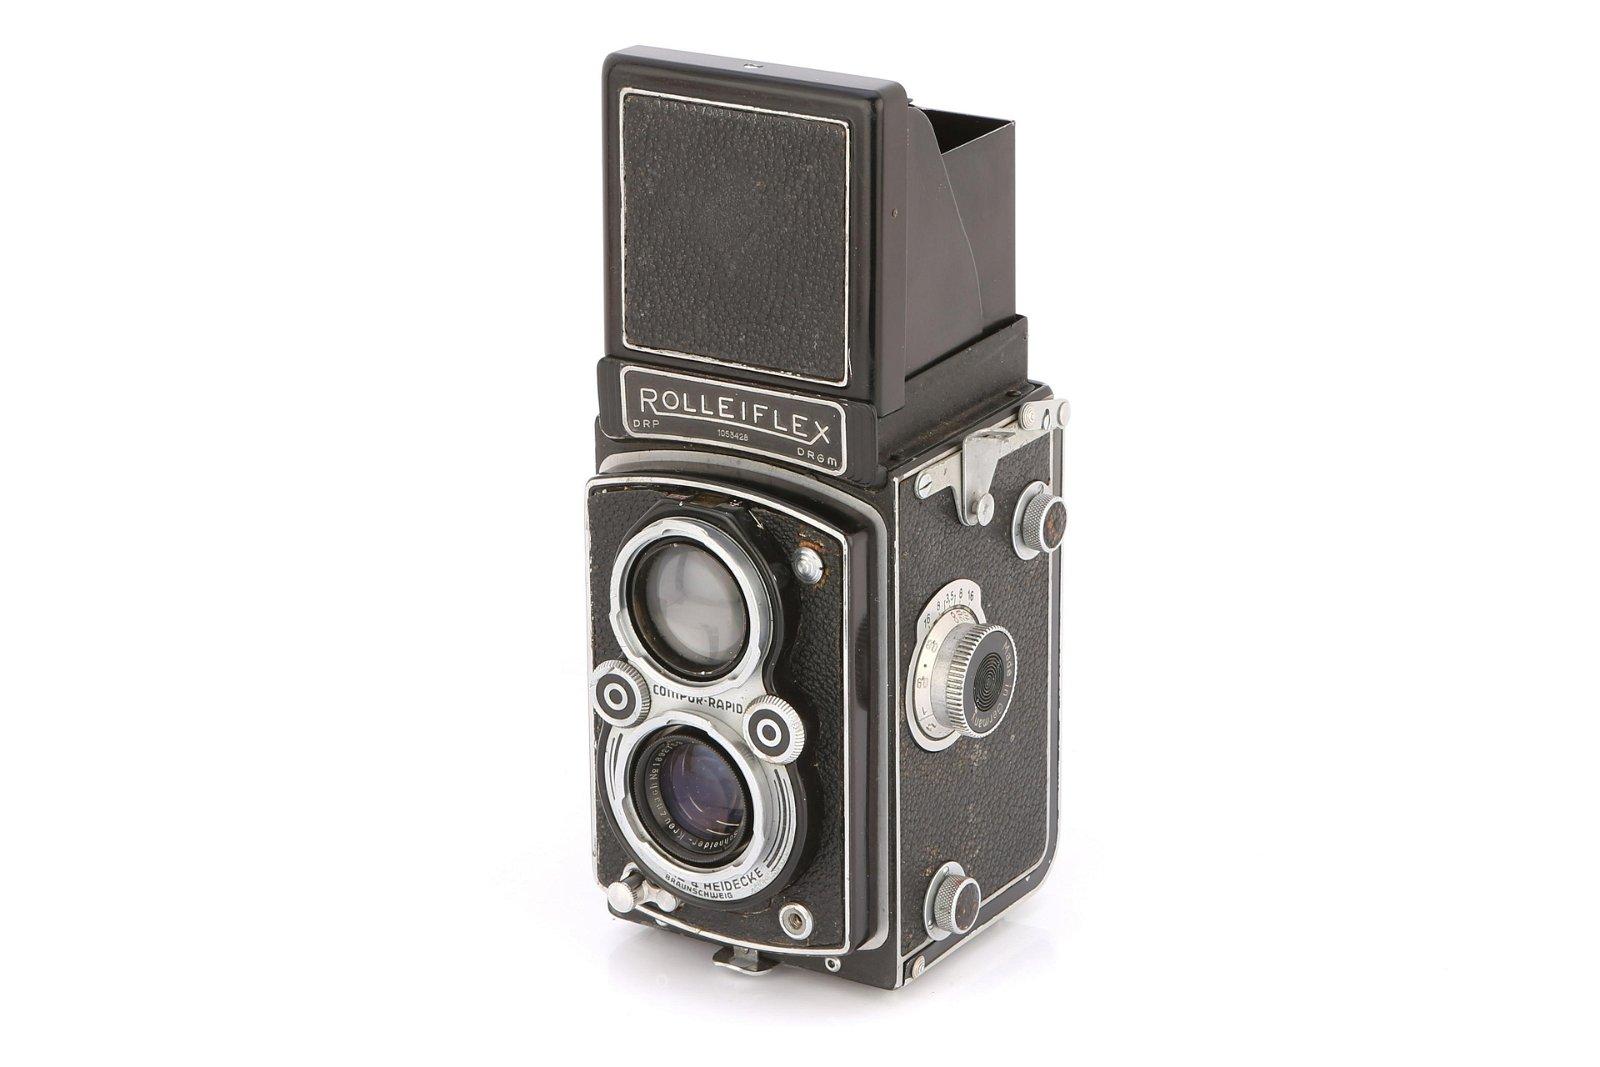 * A Rollei Rolleiflex Automat TLR Camera,